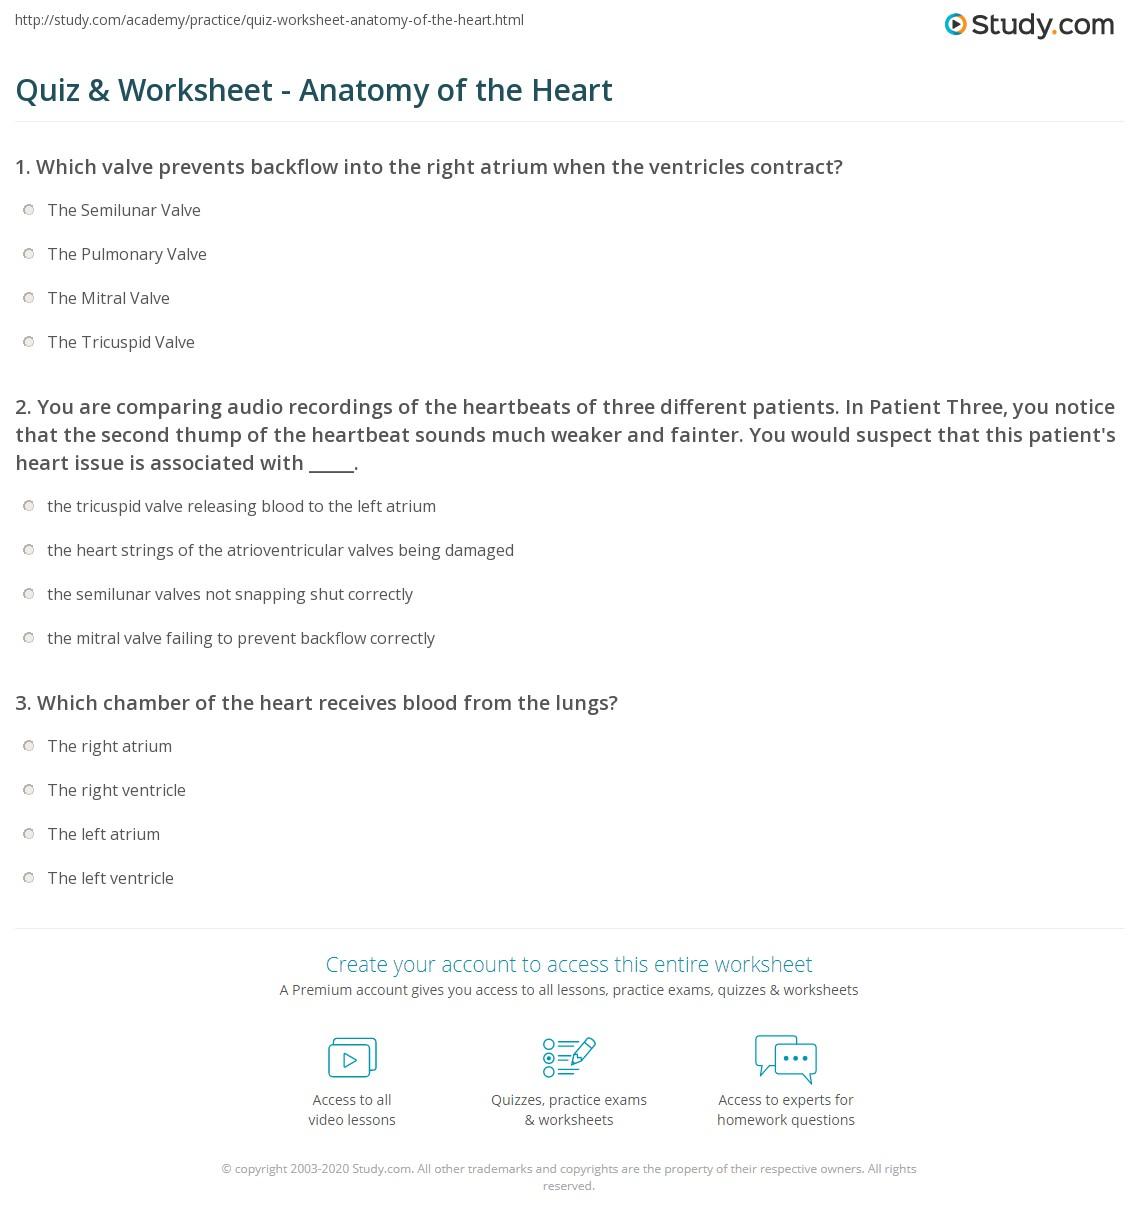 Anatomy Of The Heart Worksheet